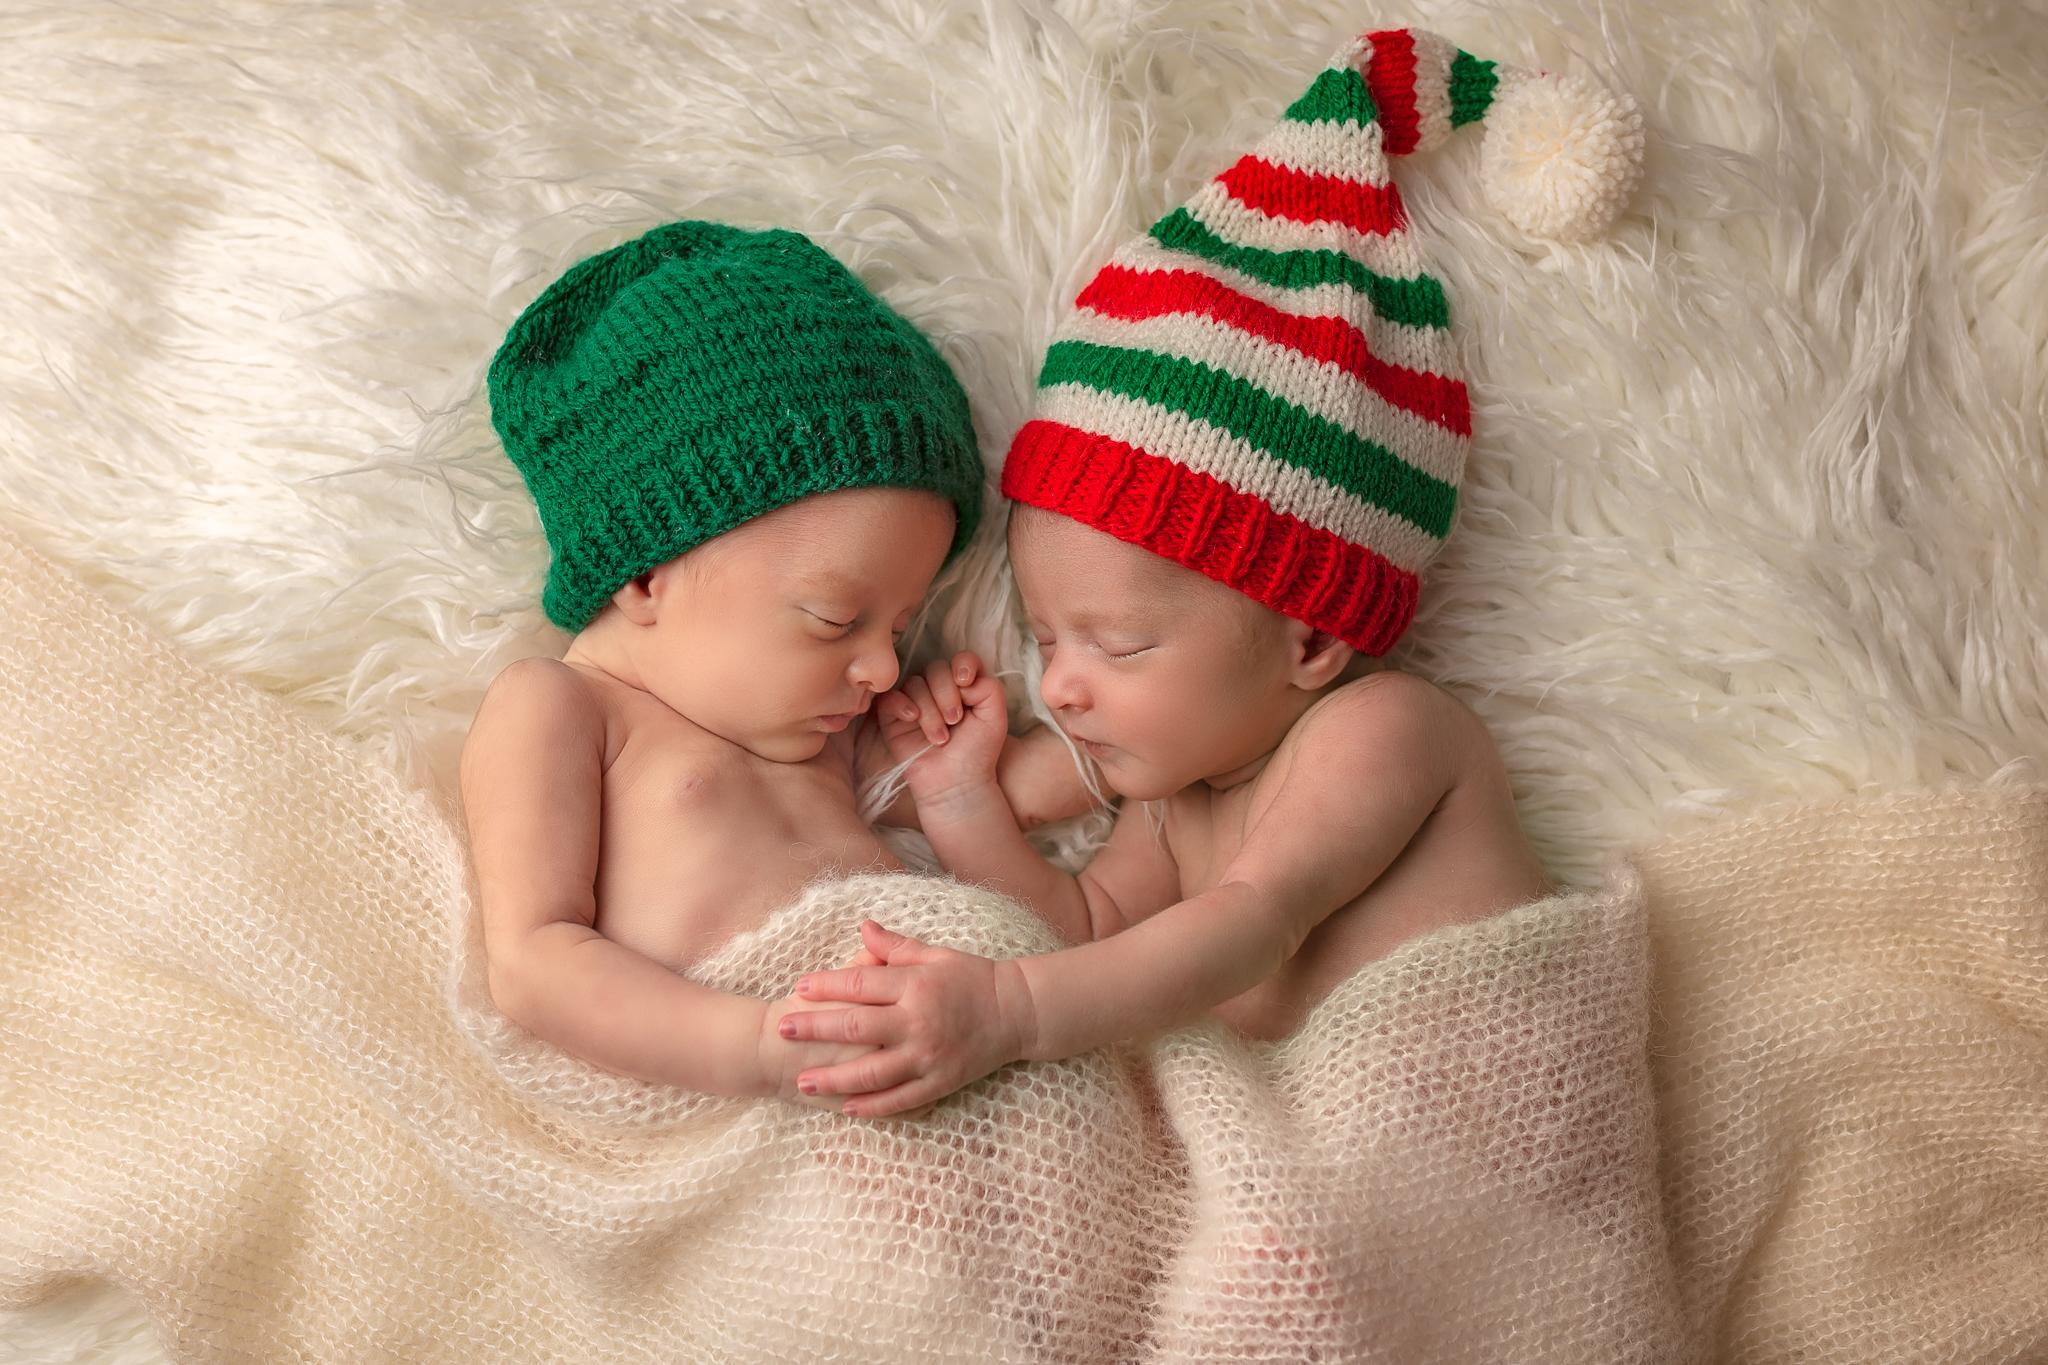 Newborn twin photographer Leeds, newborn photographer Leeds-York-Harrogate-Bradford, Yorkshire: winter theme twin session in Leeds, Yorkshire. Twin baby girls sleeping on a white blanket